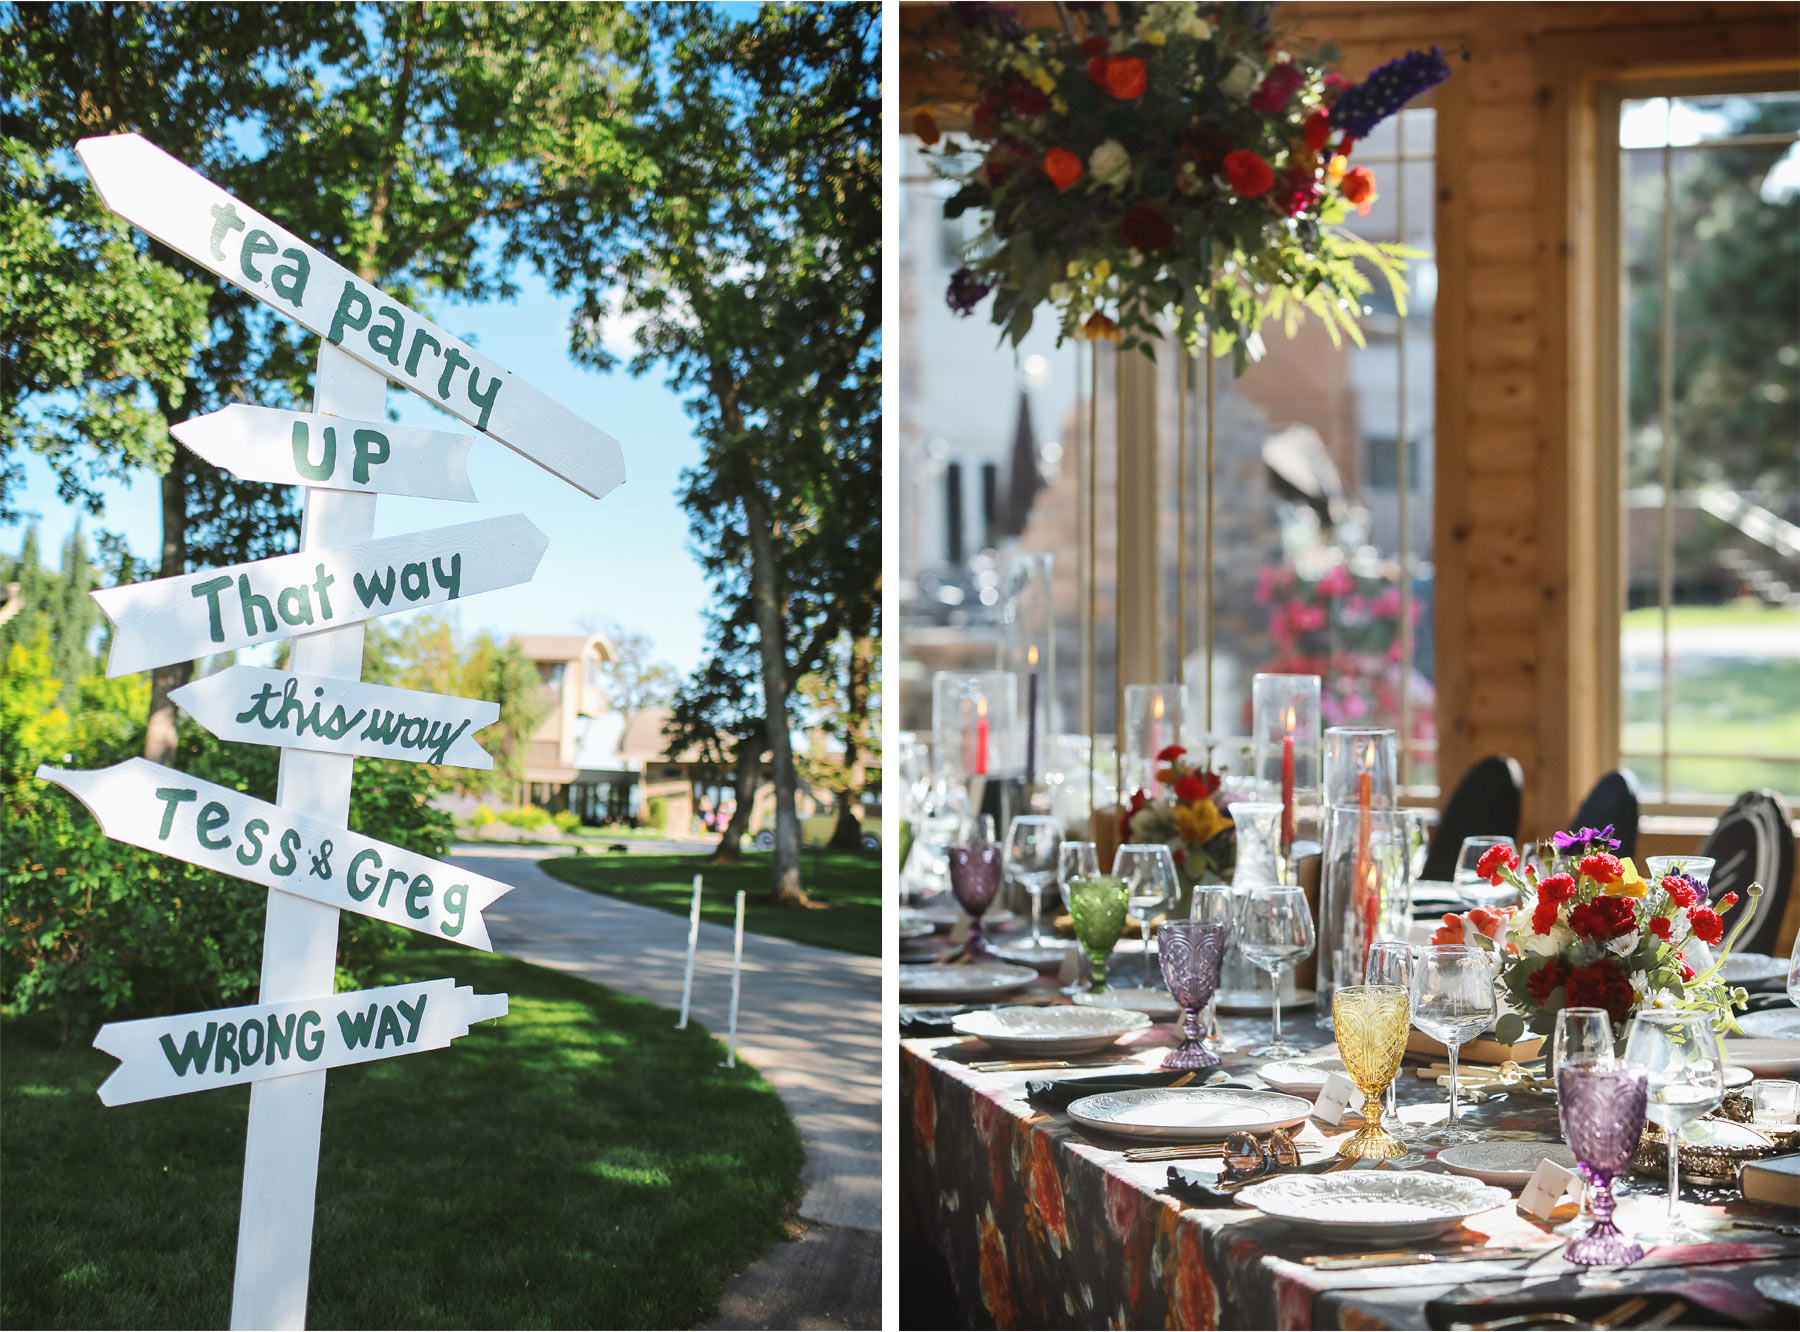 17-Vick-Photography-Wedding-Ottertail-Minnesota-Alice-in-Wonderland-Theme-Reception-Table-Decor-Sign-Tess-and-Greg.jpg